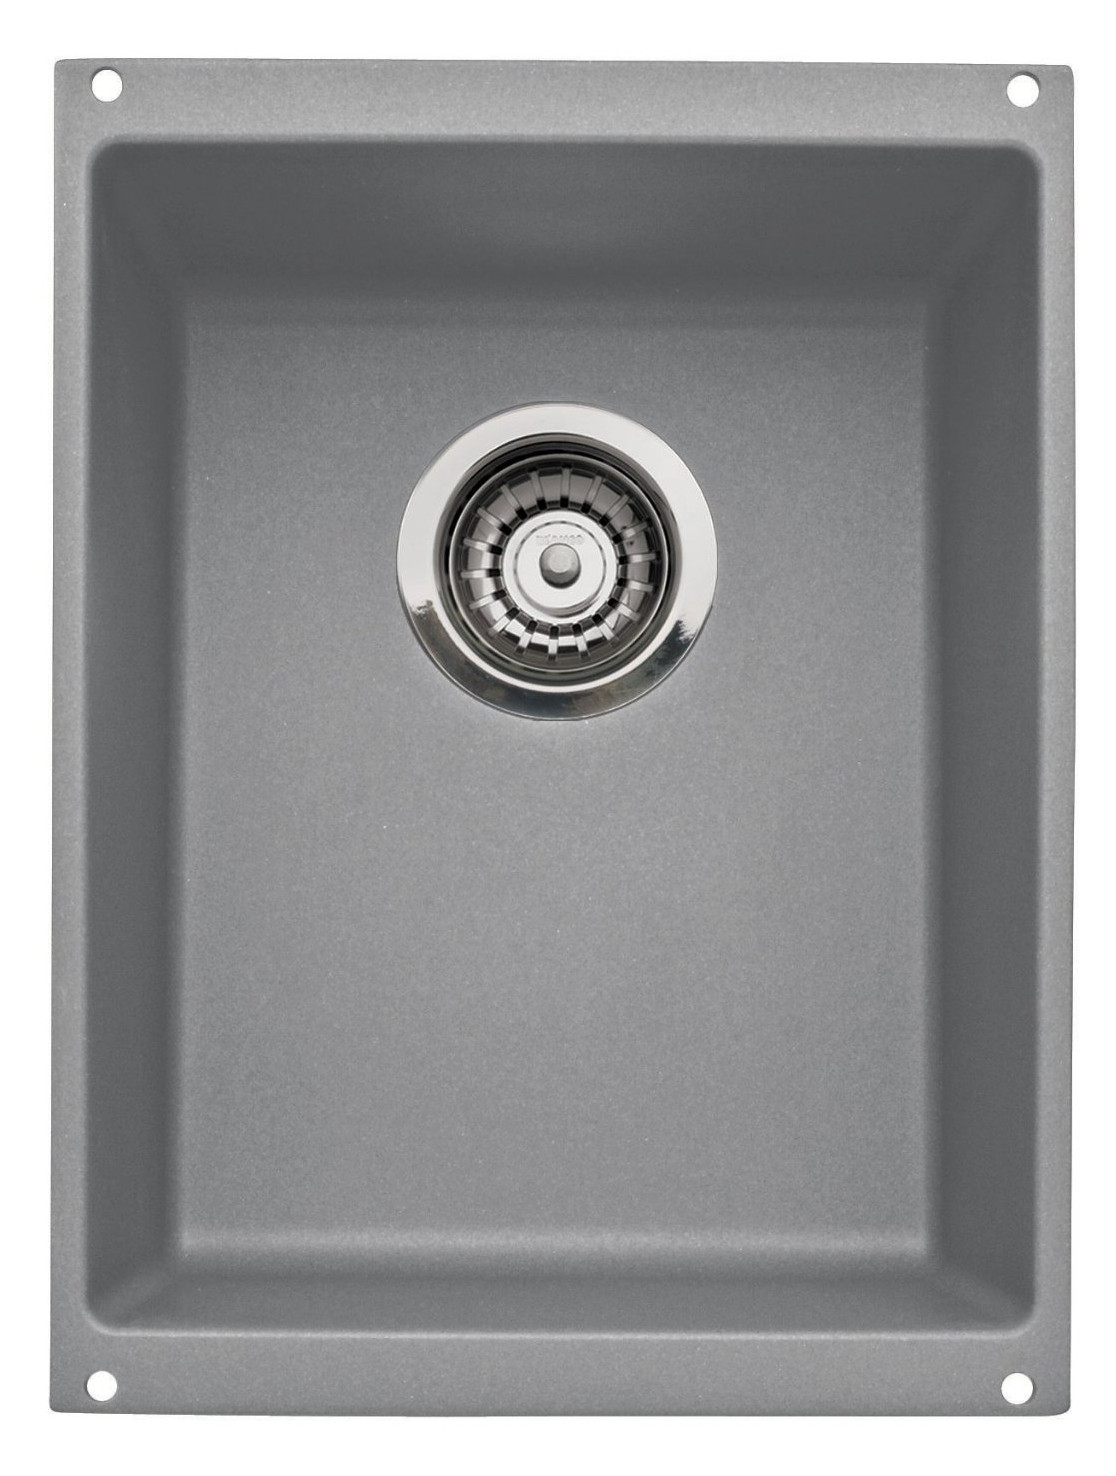 Blanco 513425 Precis Medium Rectangular Single Bowl Undermount Kitchen Sink in Metallic Gray